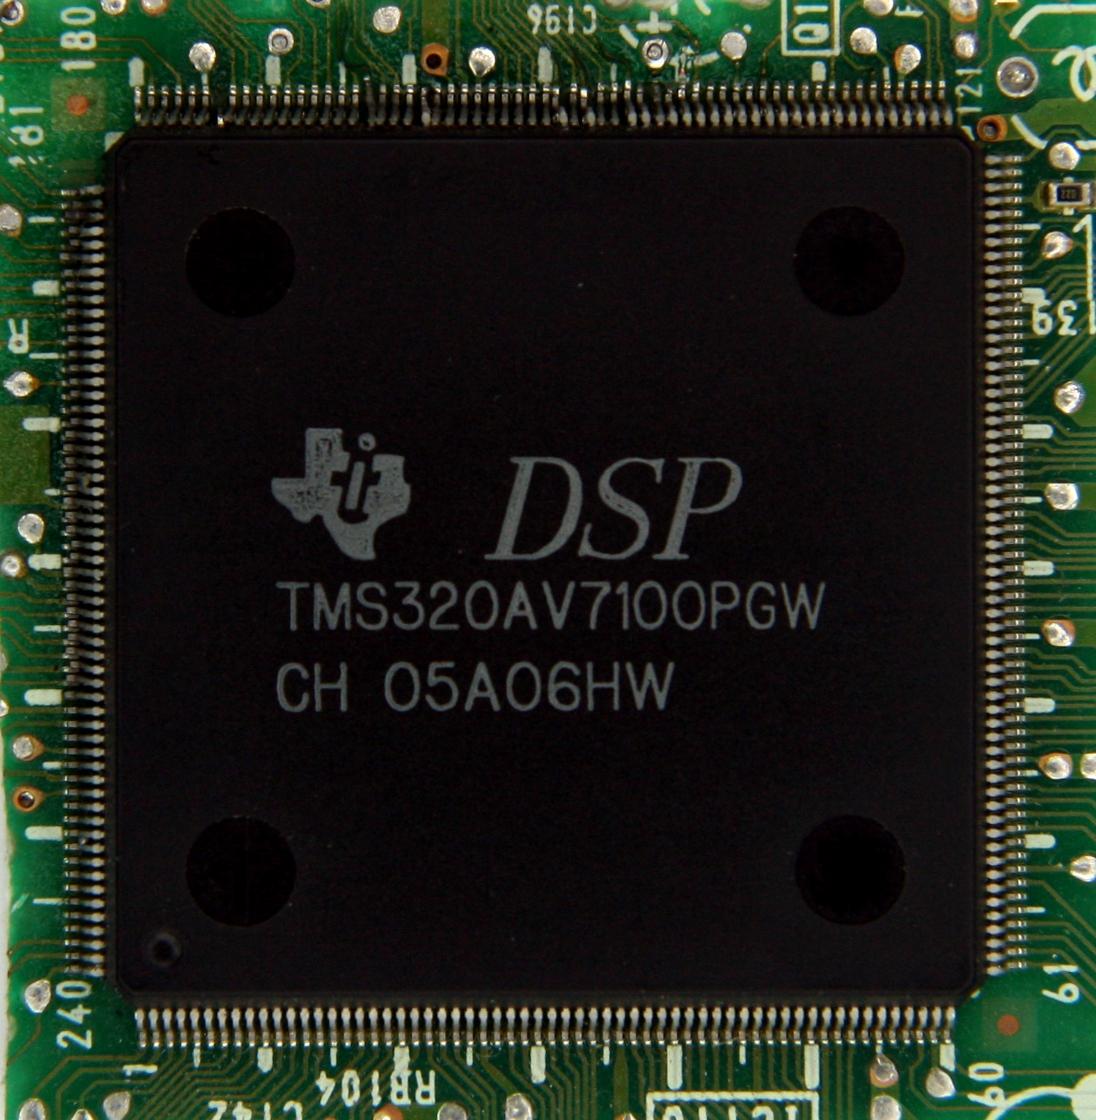 File:Ic-photo-TI--TMS320AV7100PGW--(TMS320-DSP).jpg - Wikimedia ...